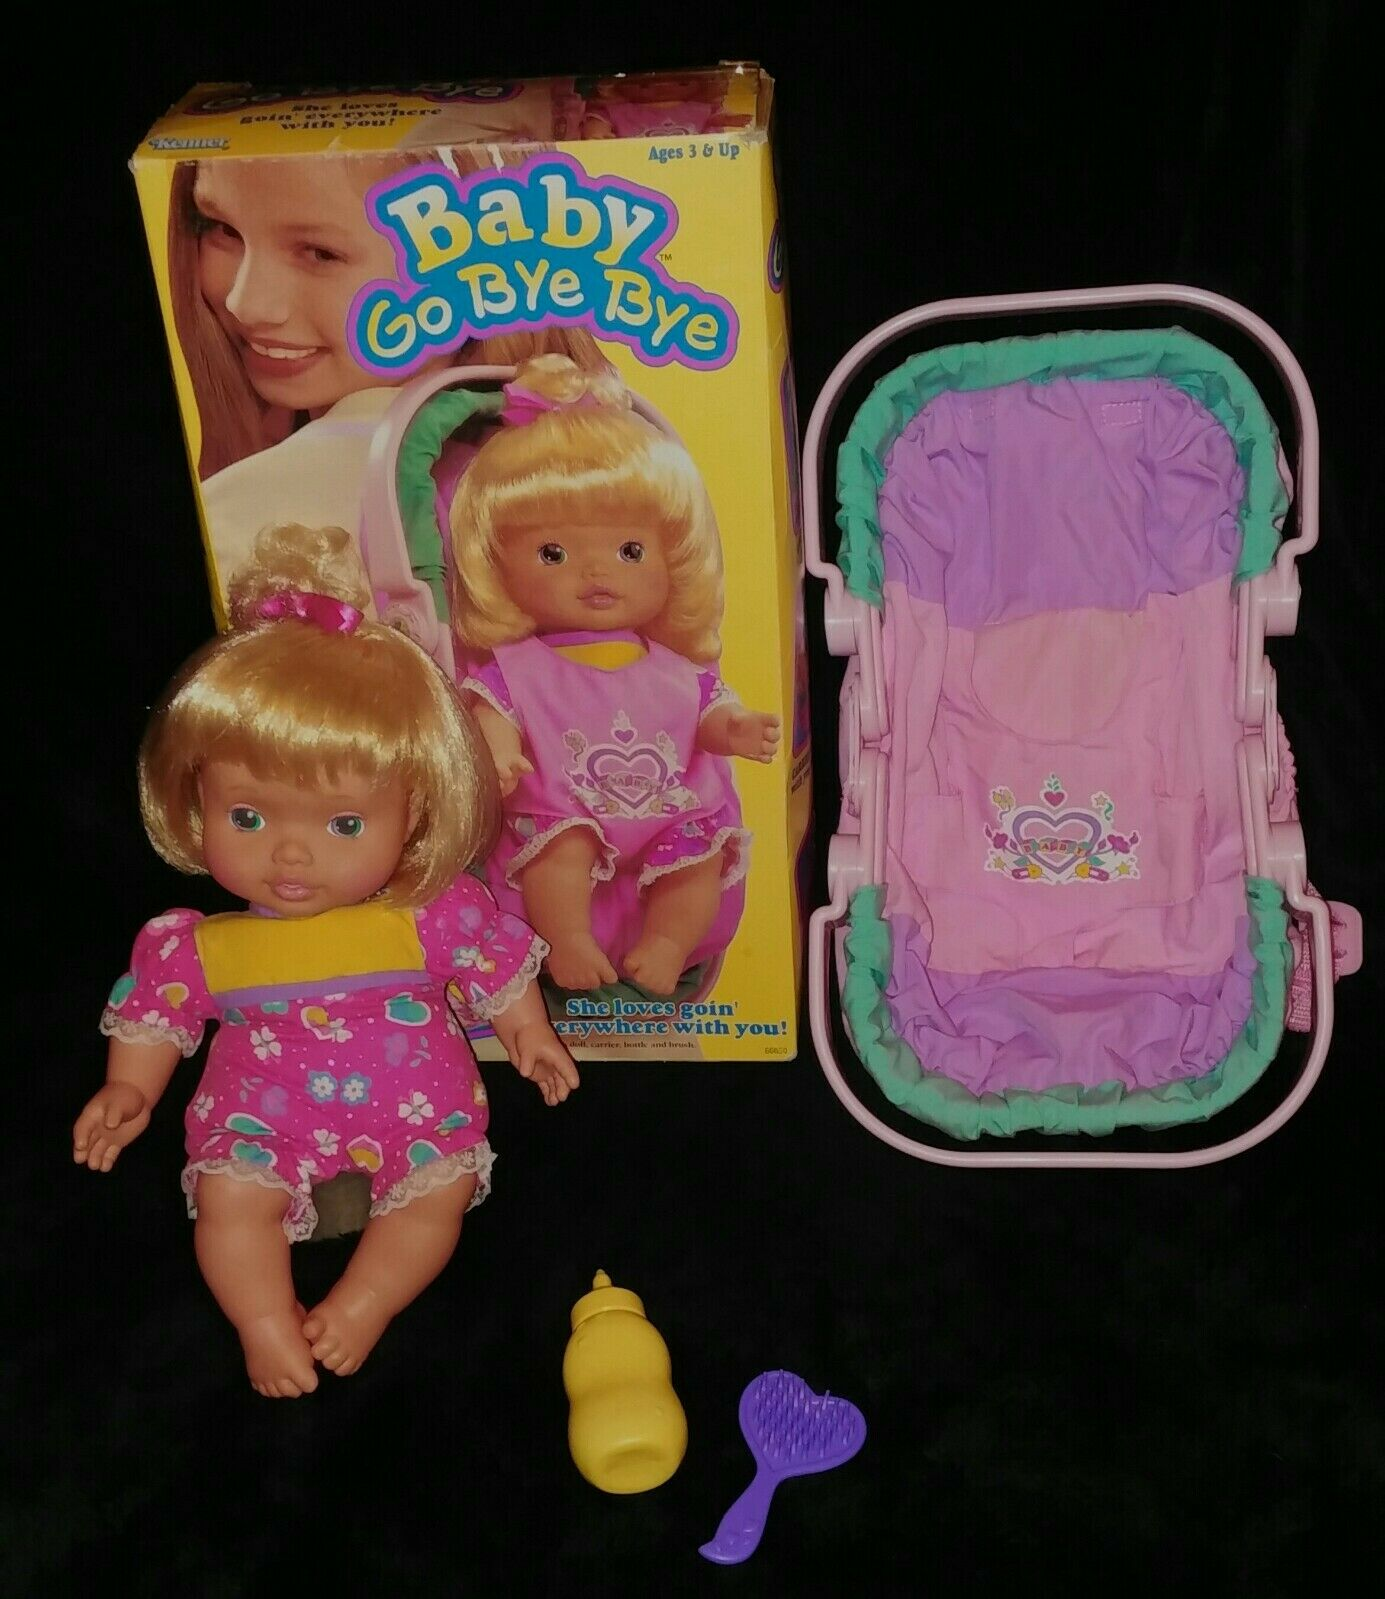 1995 Vintage Kenner Baby All Gone Go Bye Bye Doll Bottle & Carrier COMPLETE+ BOX